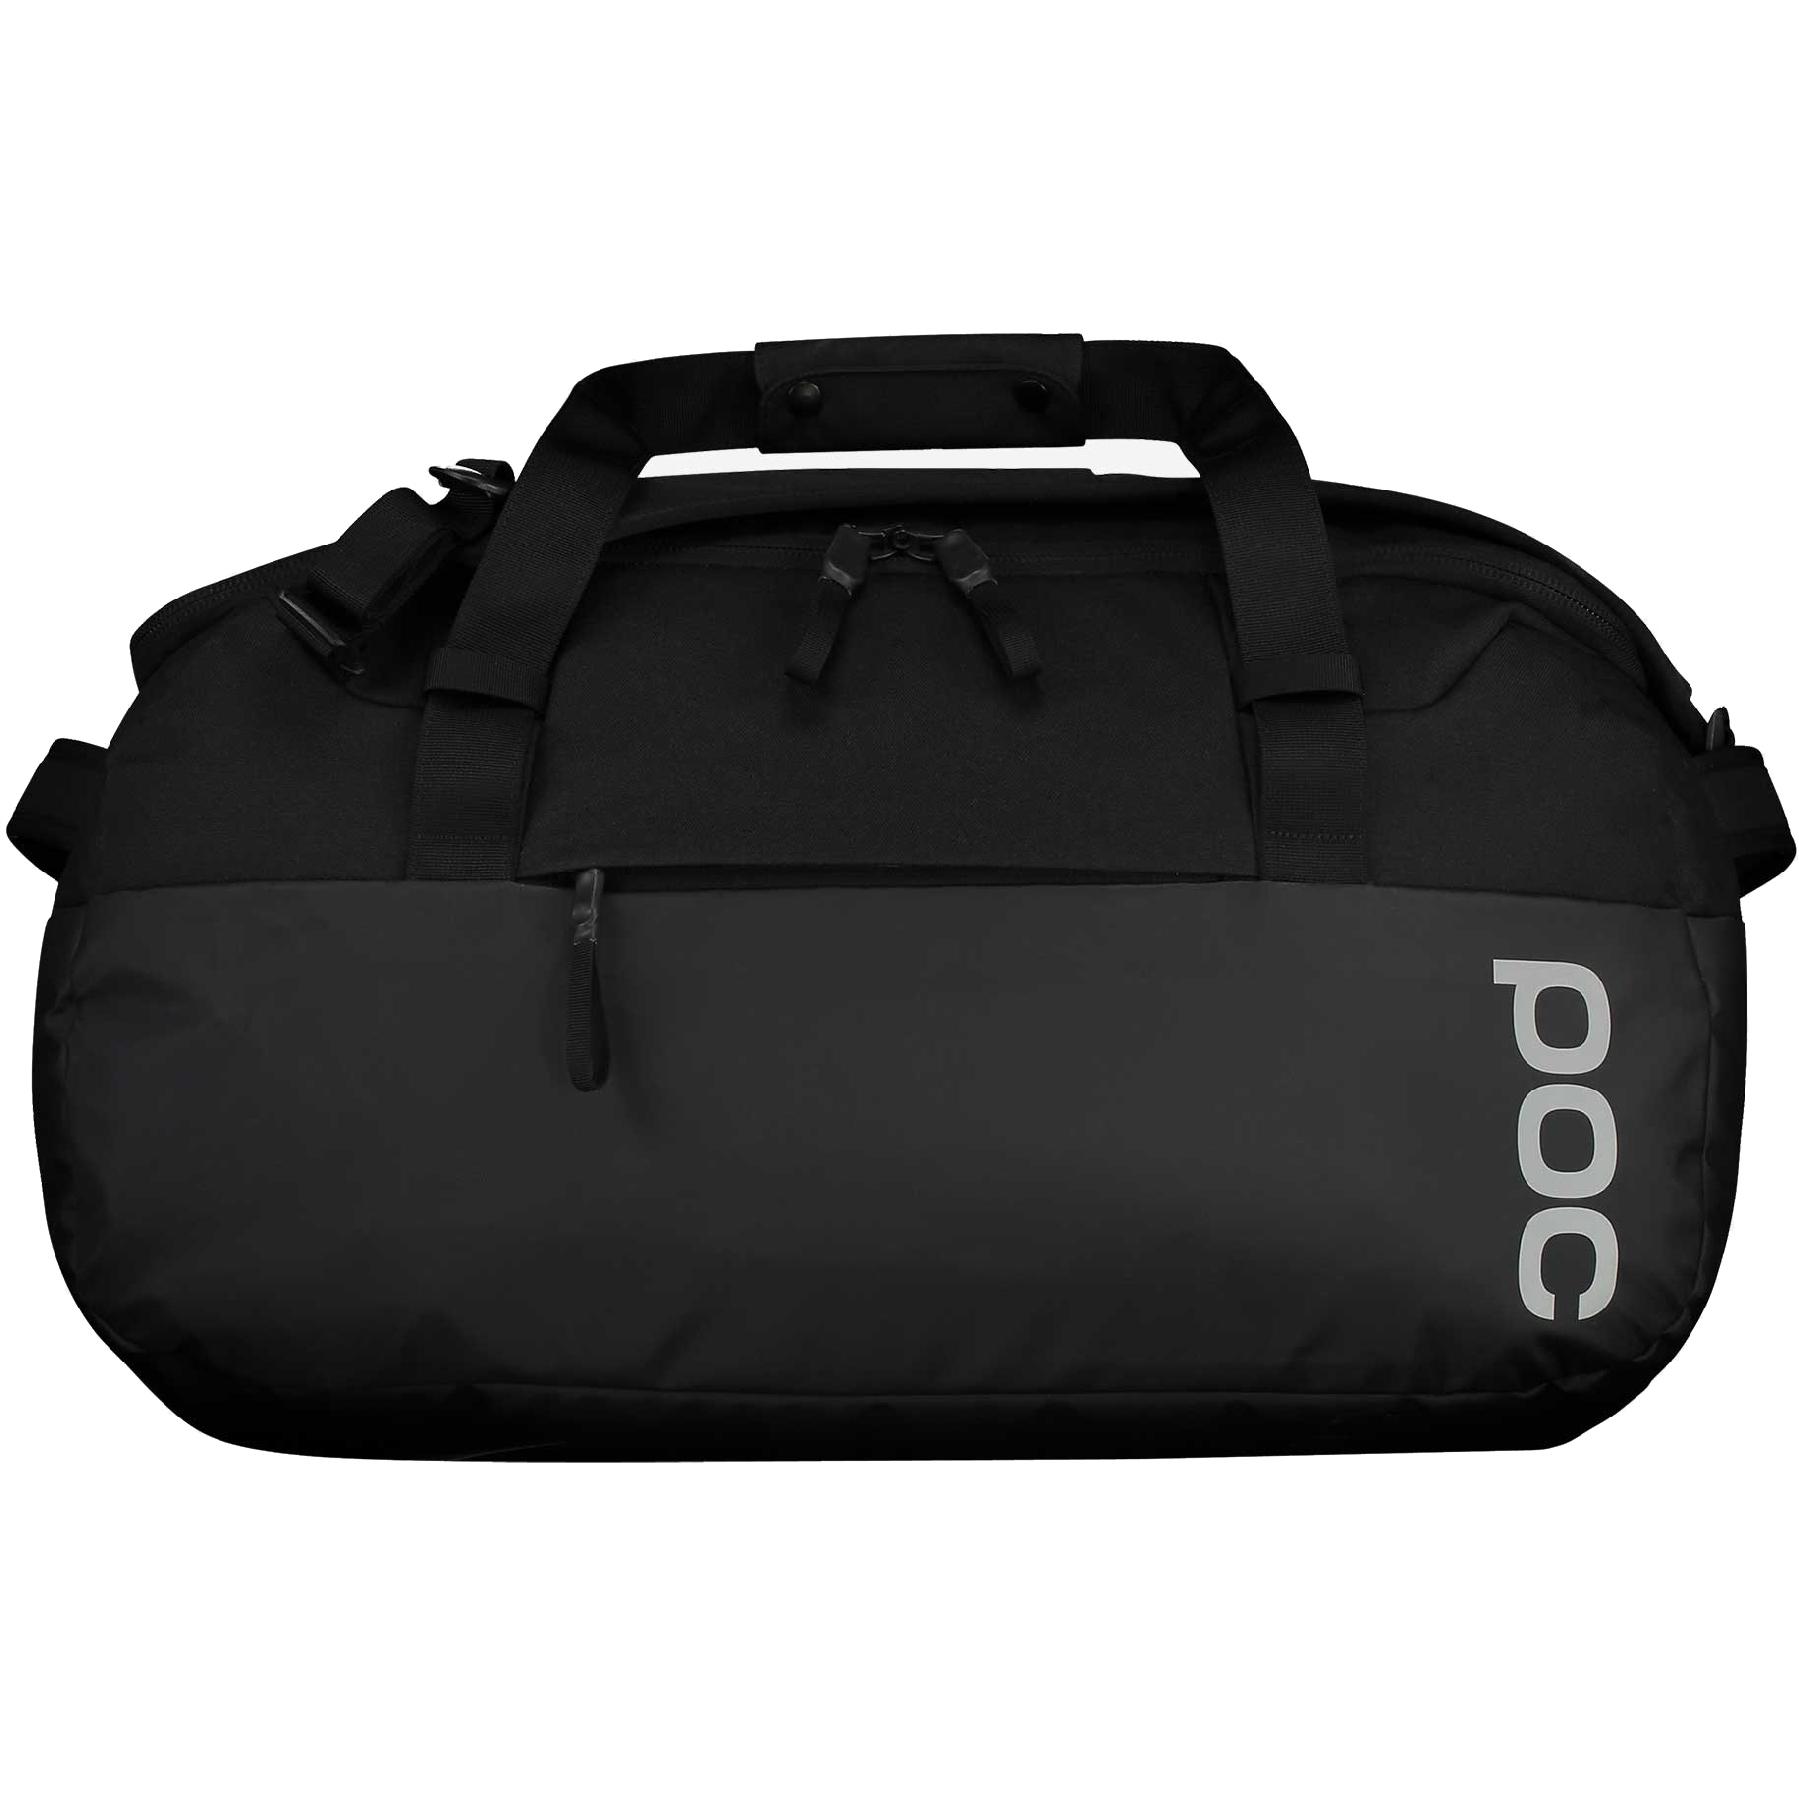 Produktbild von POC Duffel Bag 50L - Uranium Black